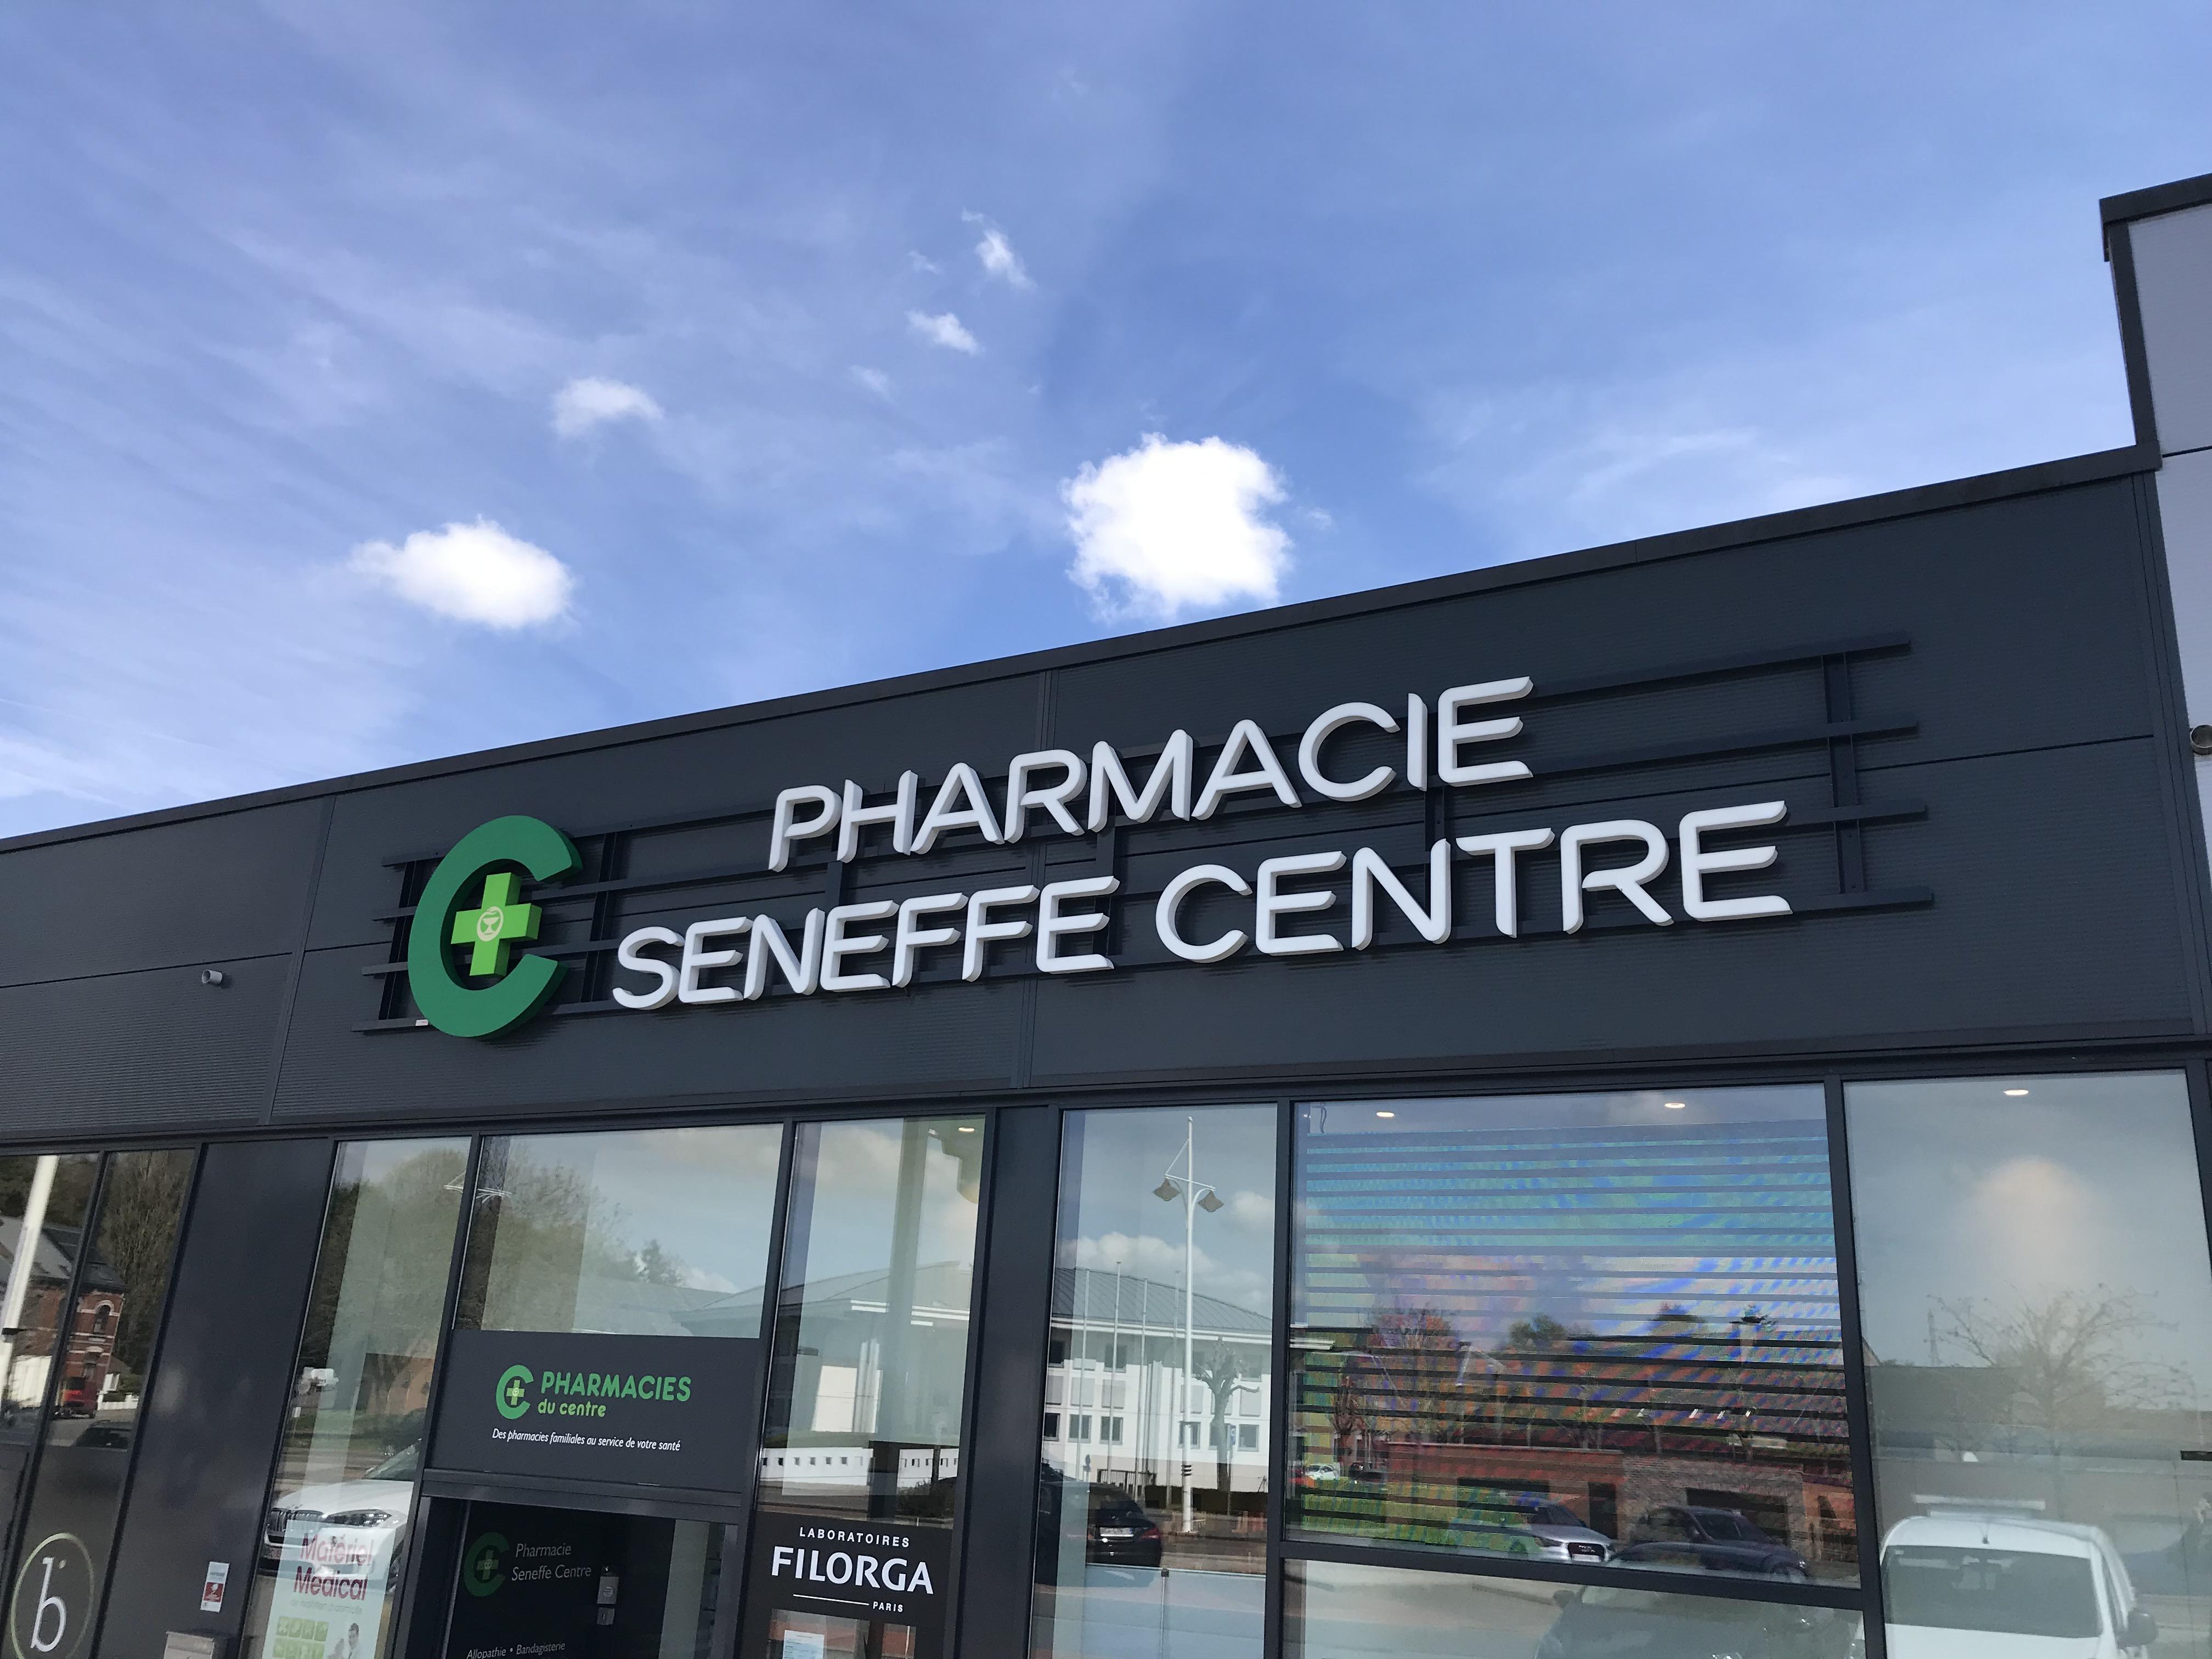 Enseigne et croix de pharmacie Pharmacie de Seneffe